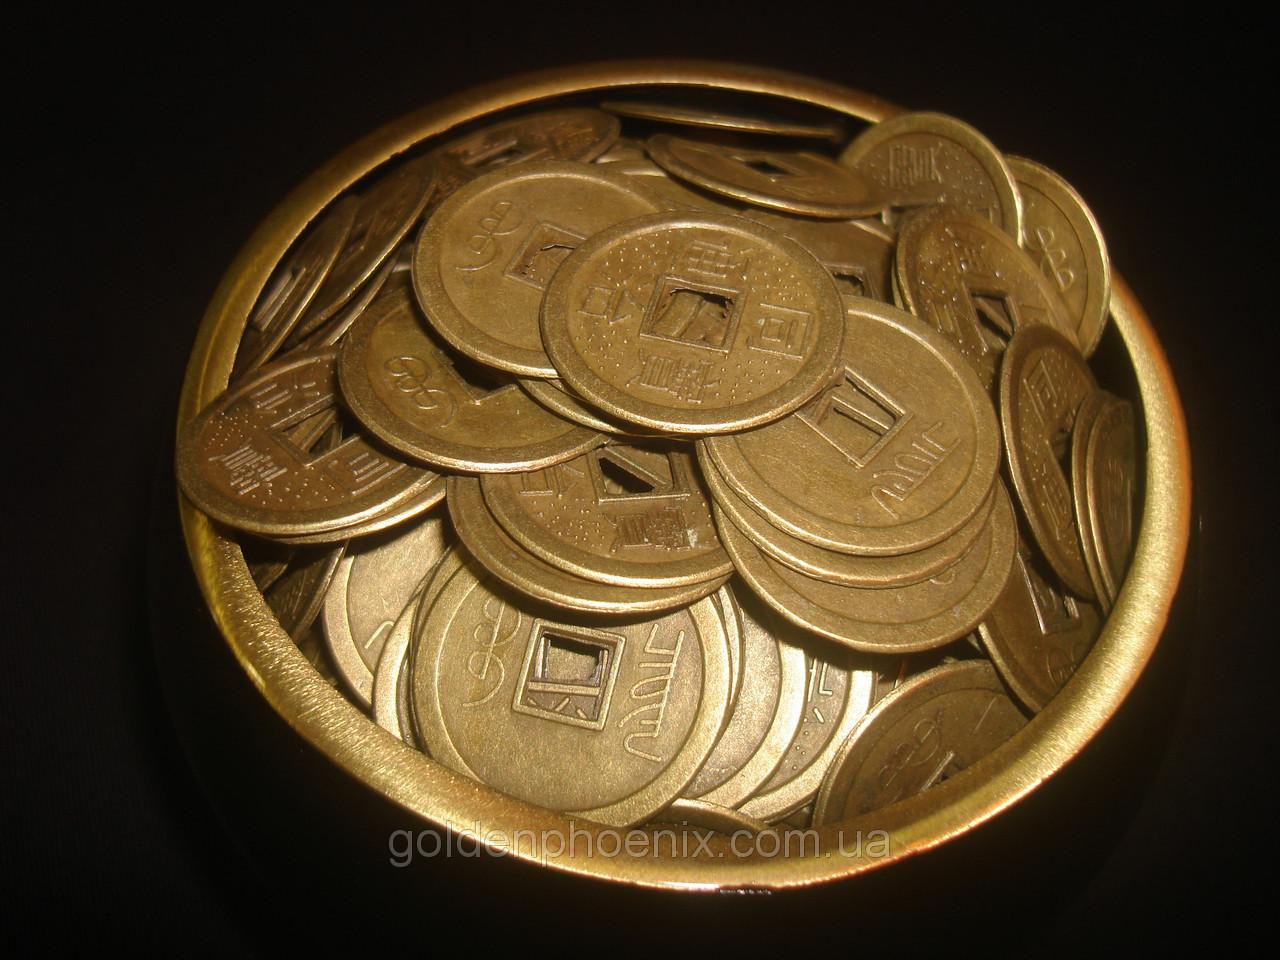 Монеты фен-шуй китайские 12